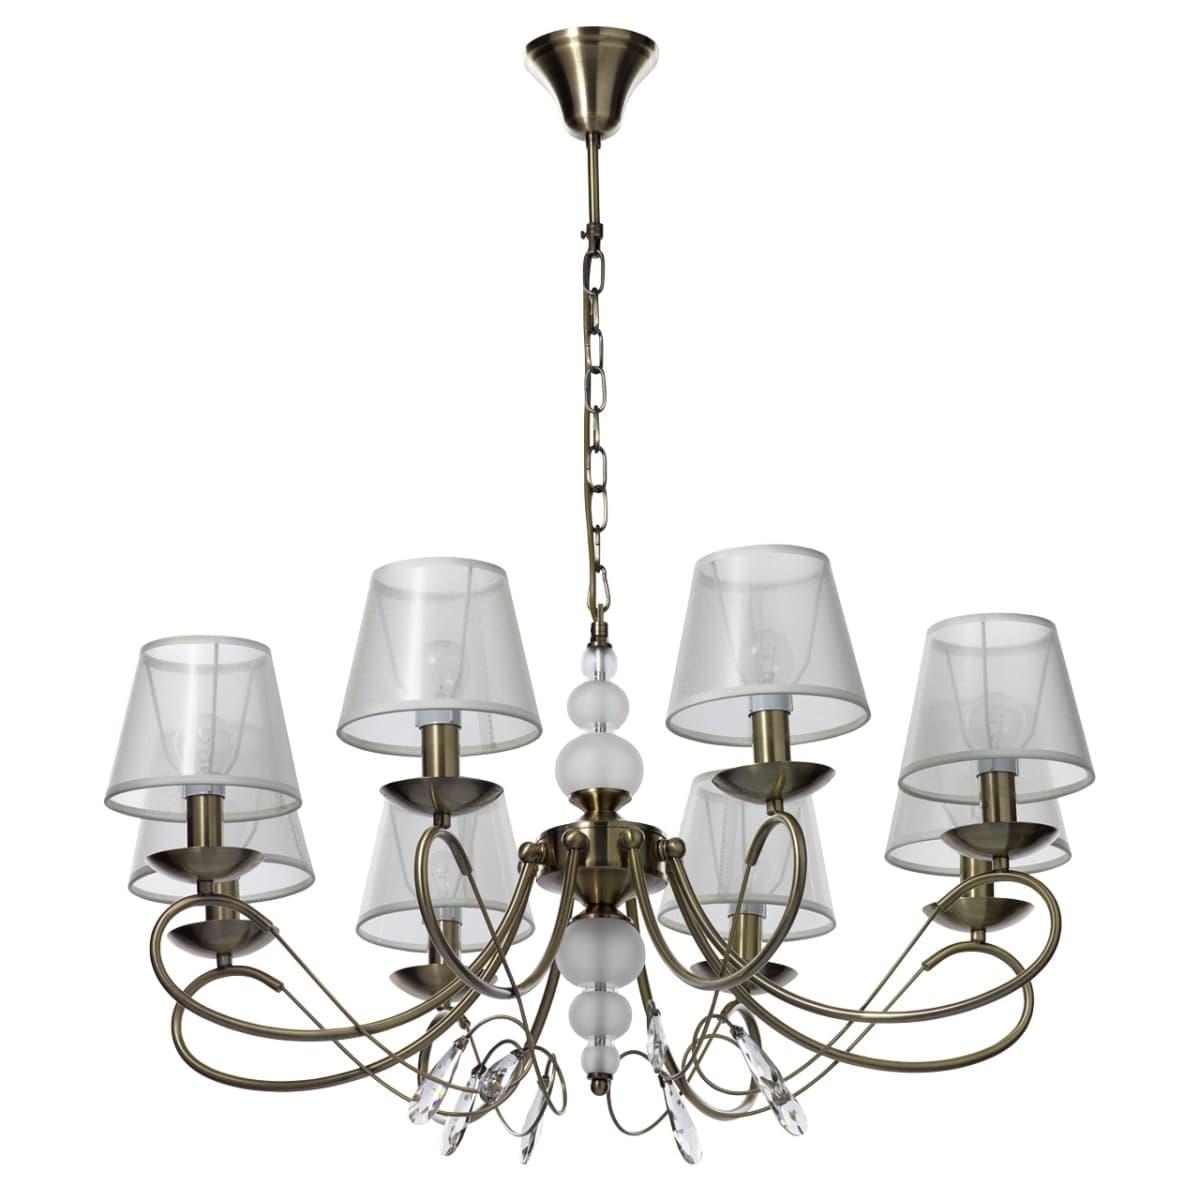 Candelabru MW-Light Elegance Federica 684012408 vivre.ro